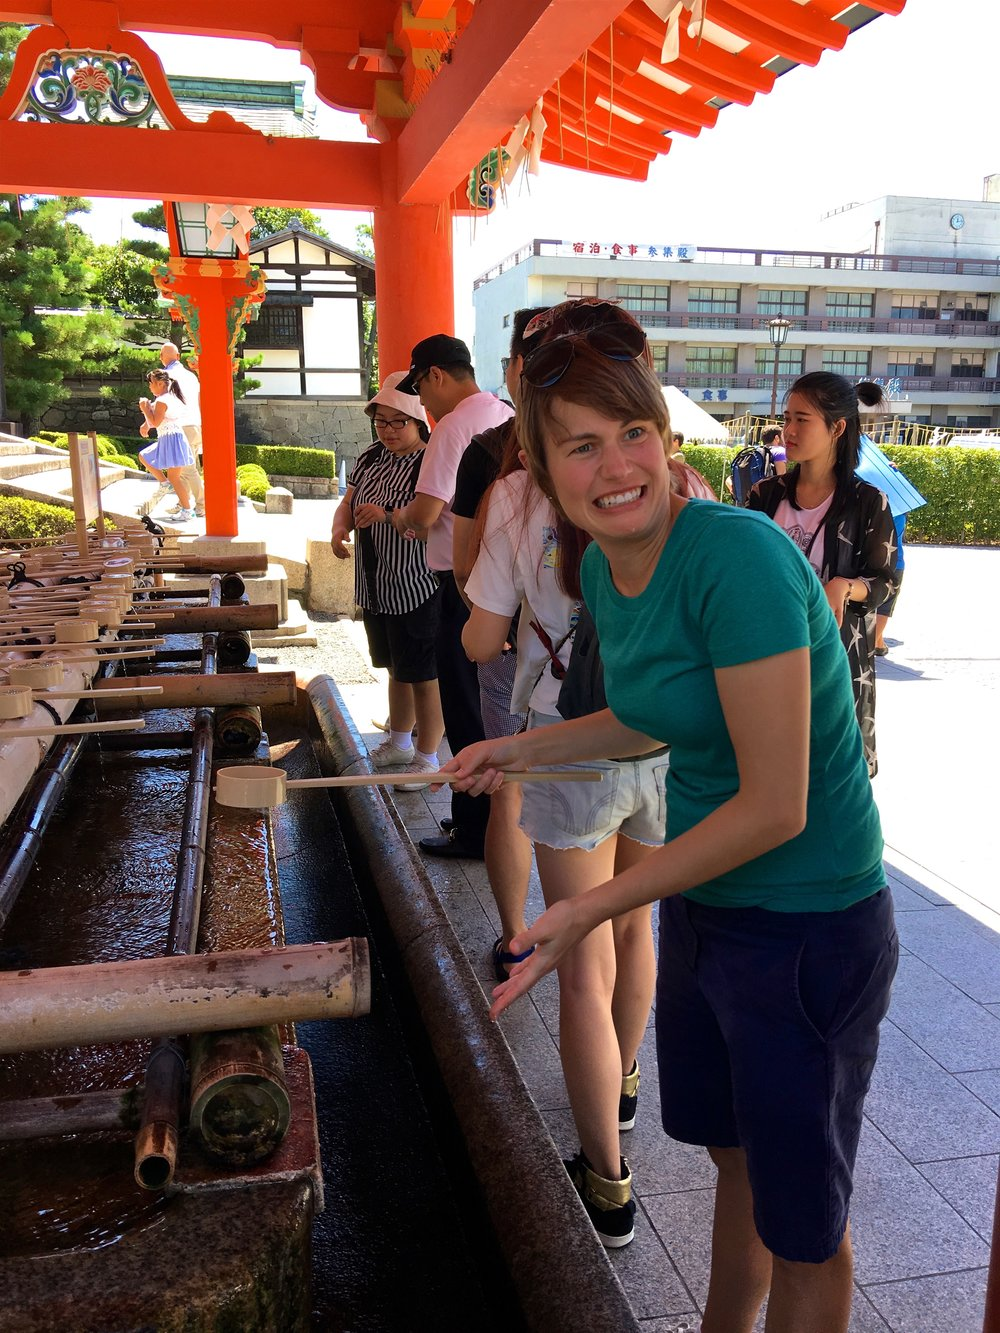 teri_Japan_Kyoto_FushimiInariTaisha_spiritedtable_photo13.jpg